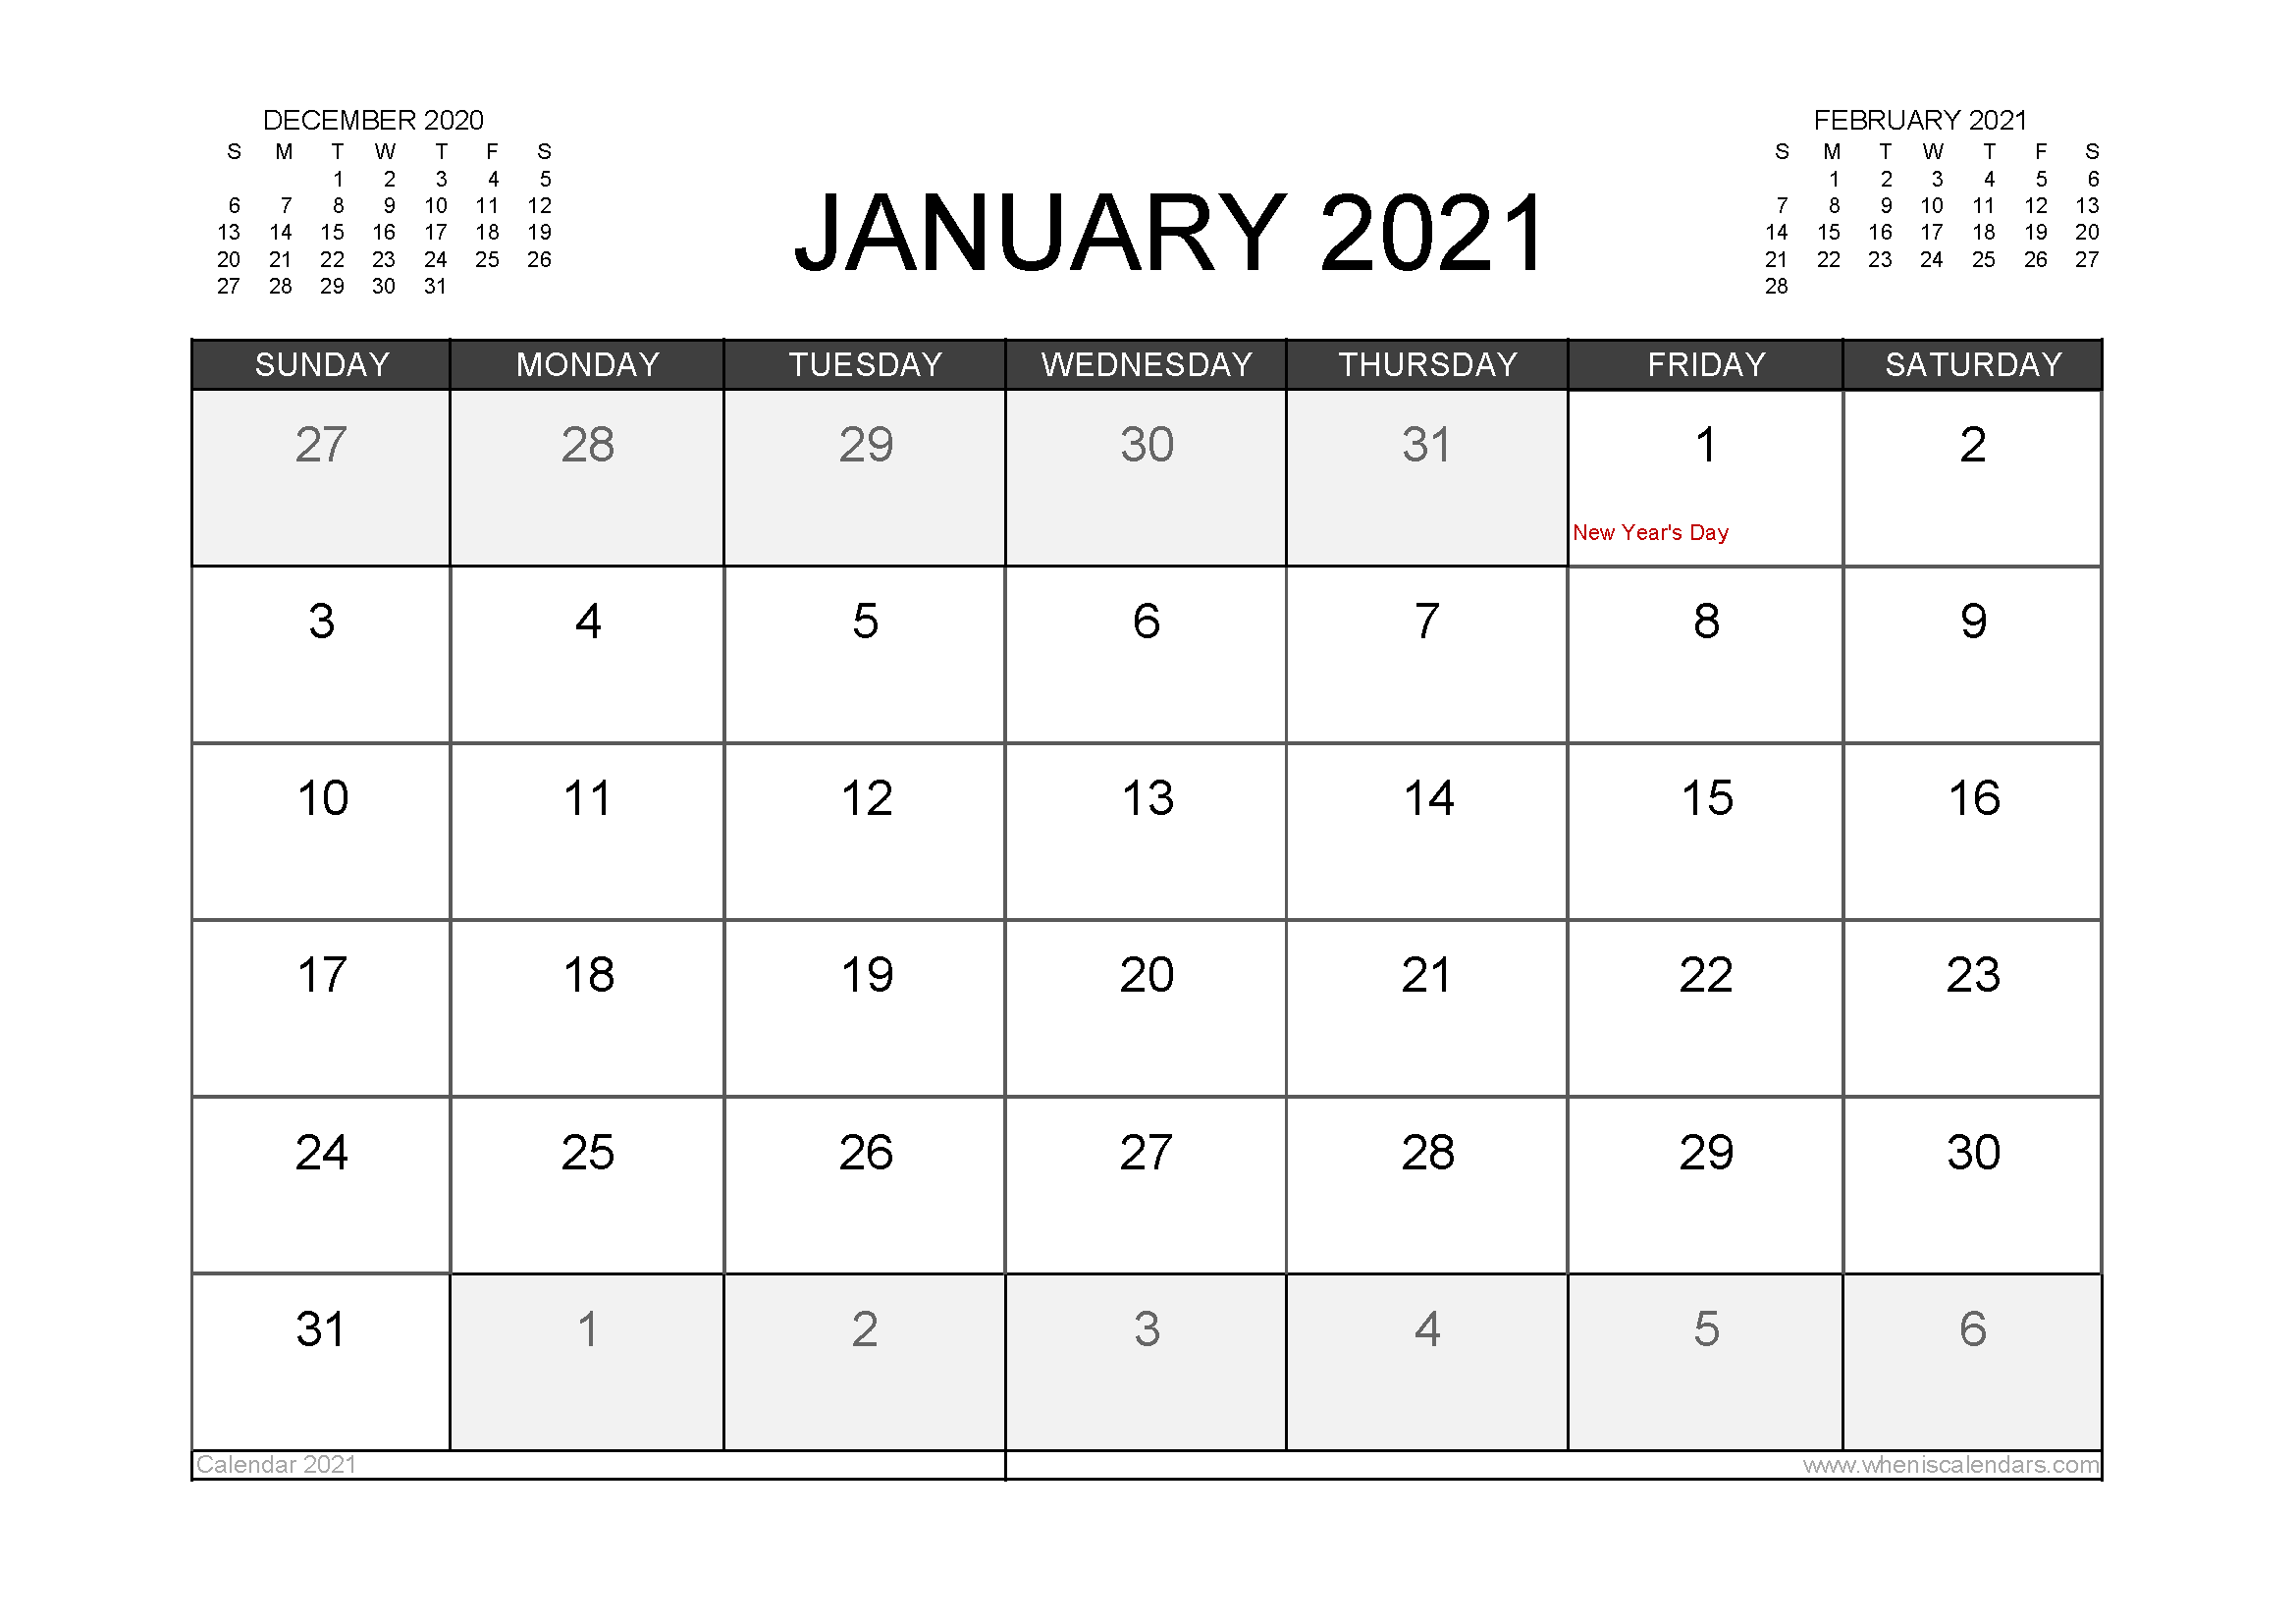 January 2021 Calendar Canada with Holidays